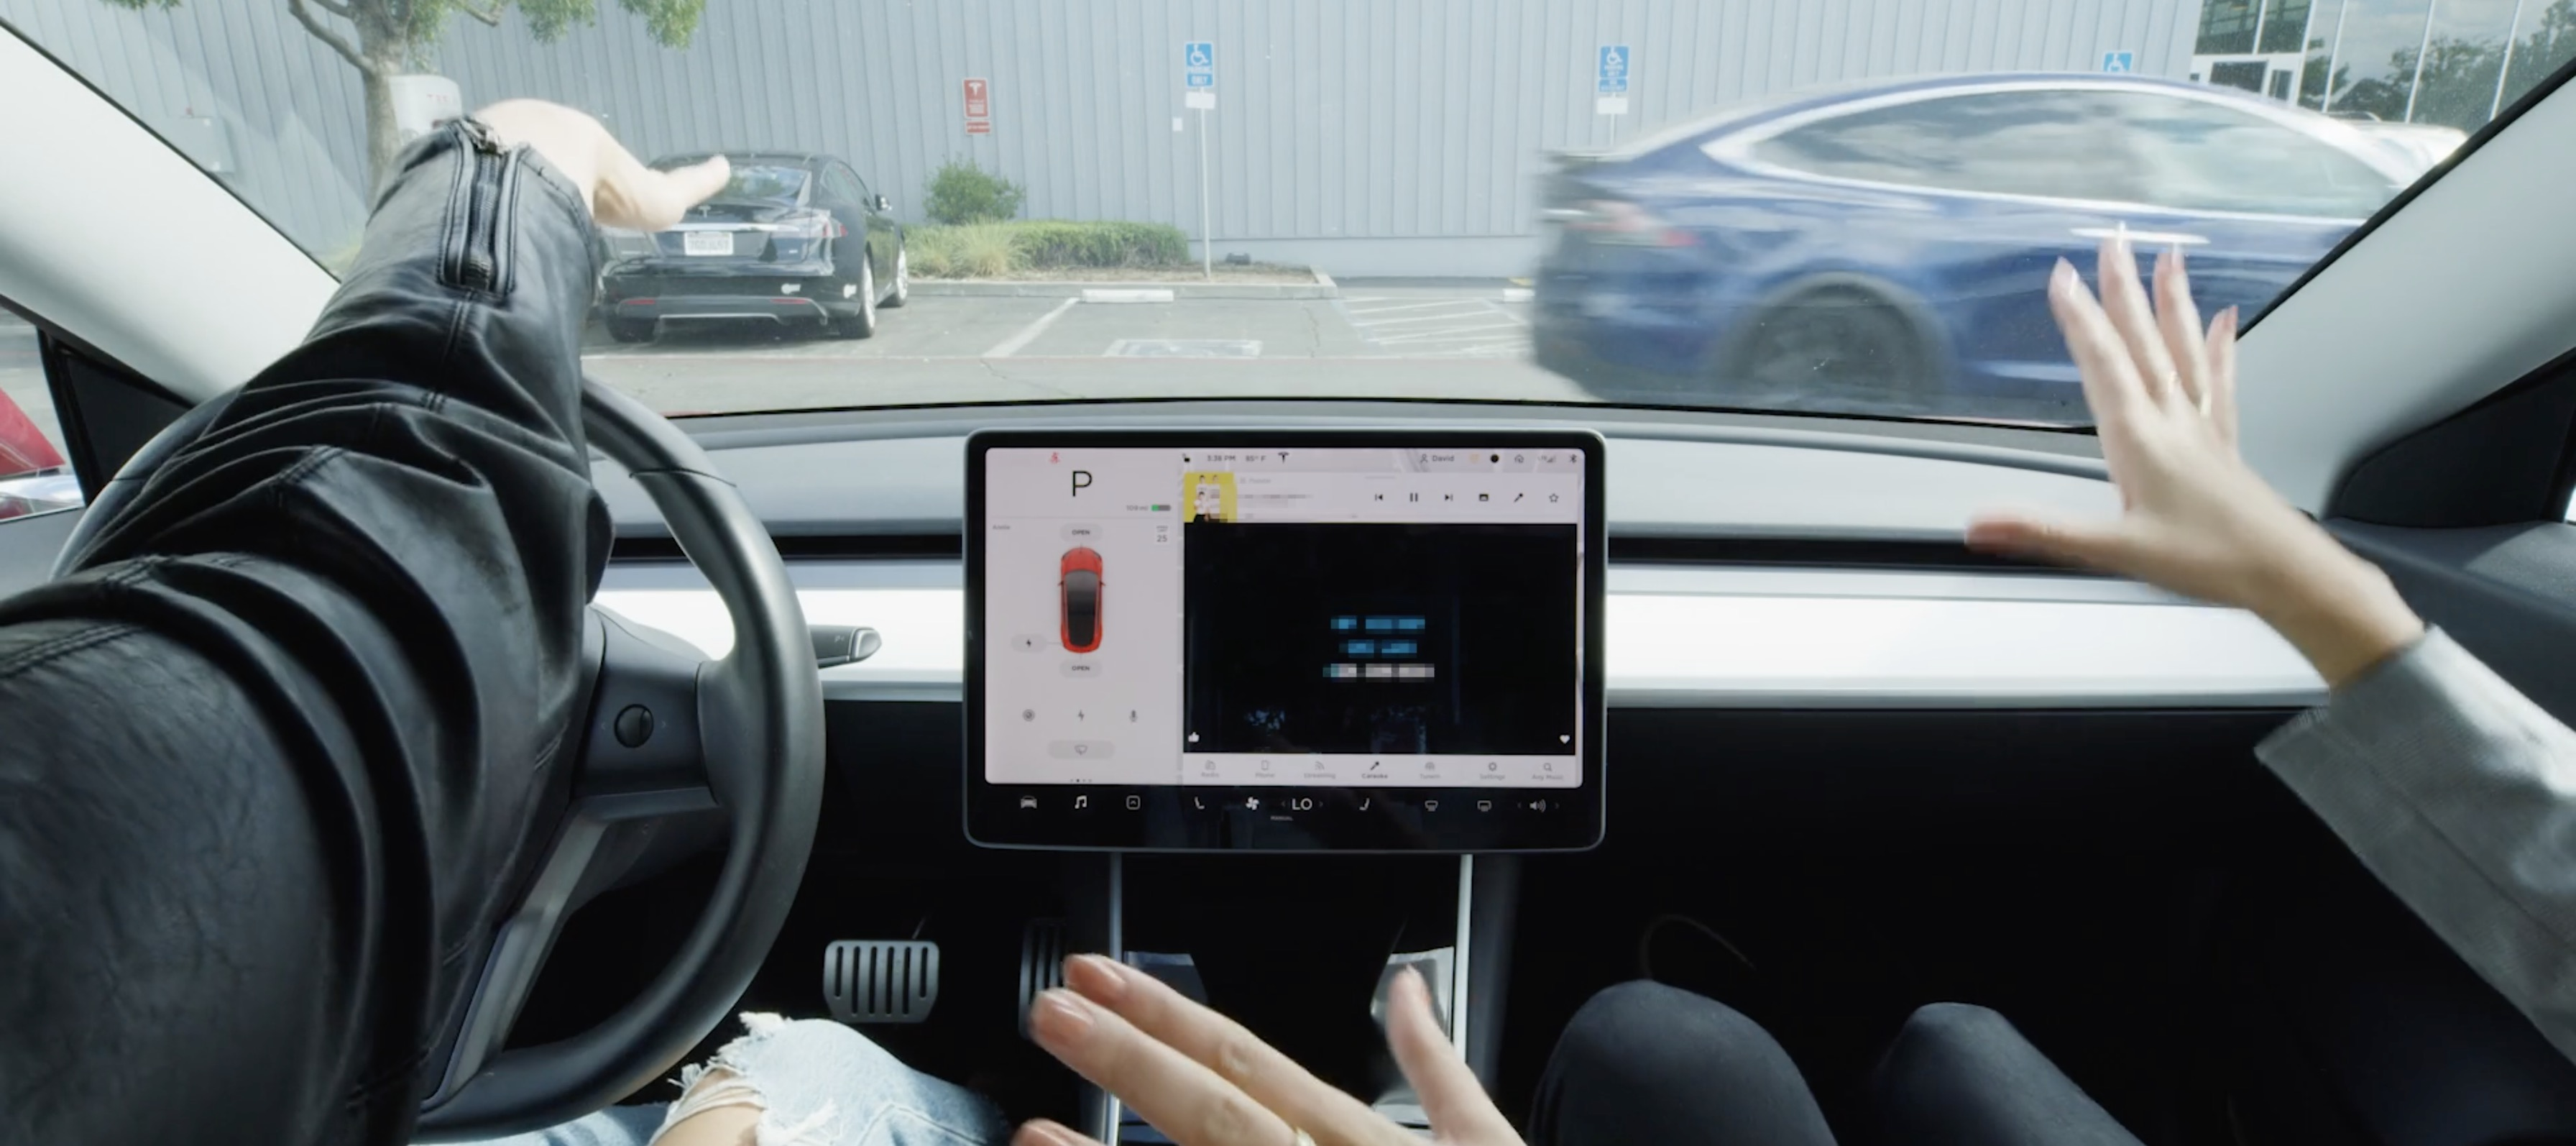 Tesla-caraoke.jpg?quality=82&strip=all